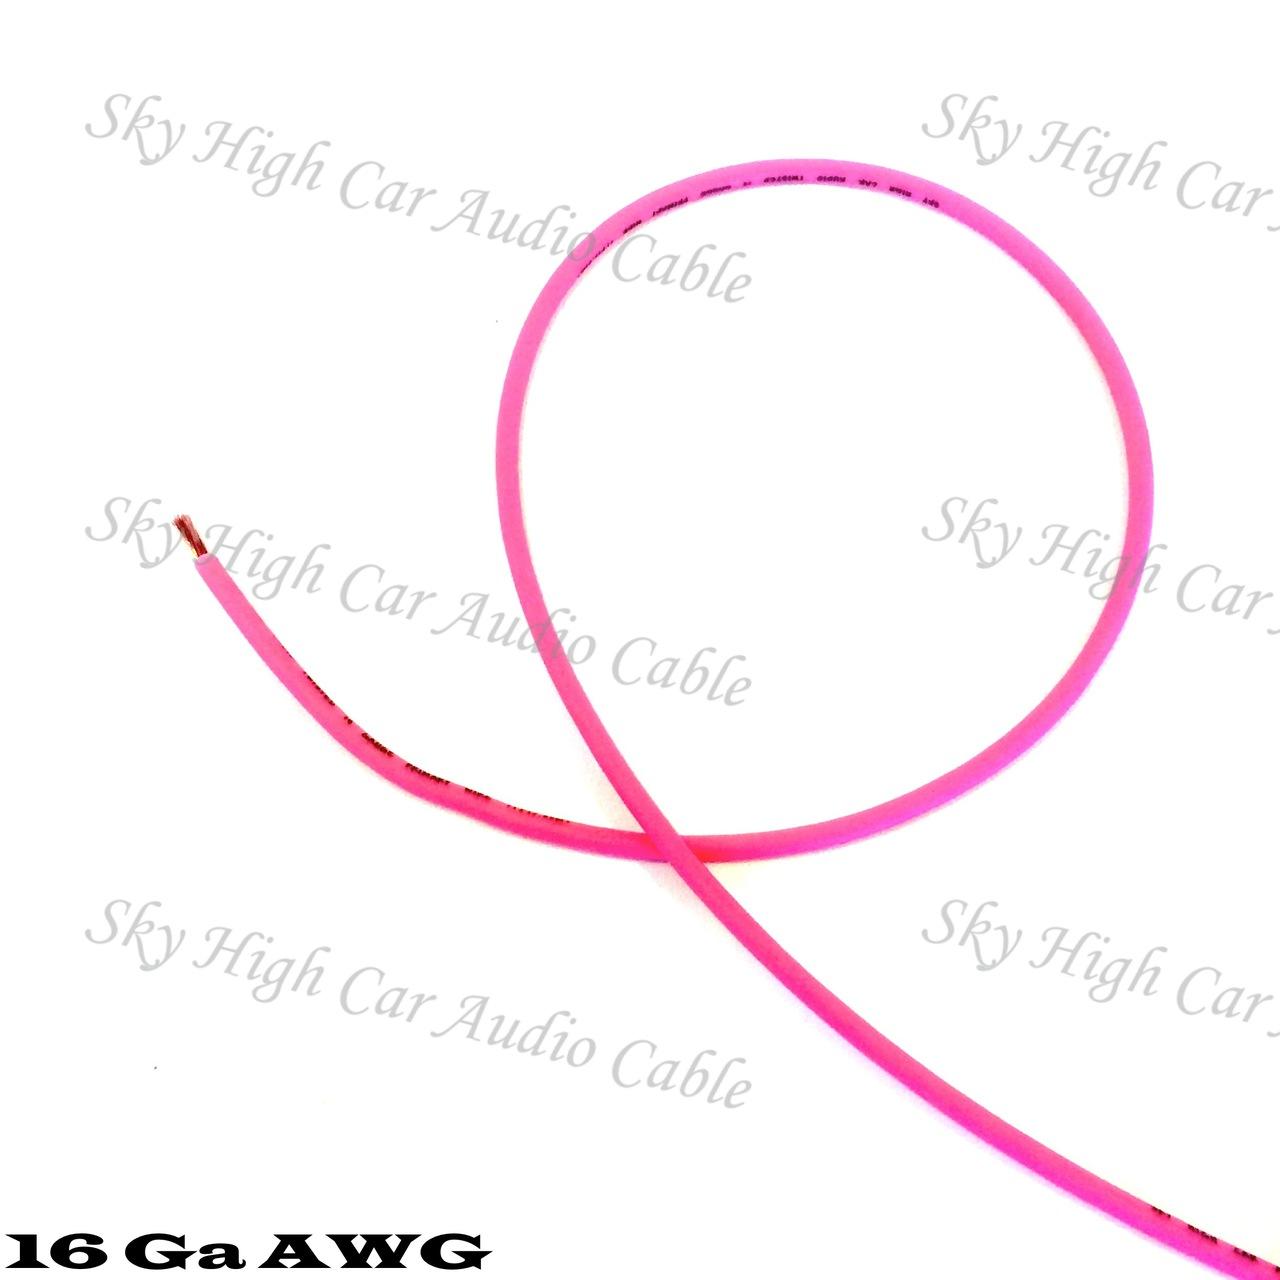 Sky High Car Audio CCA 16 Gauge Primary Wire 25ft-500ft